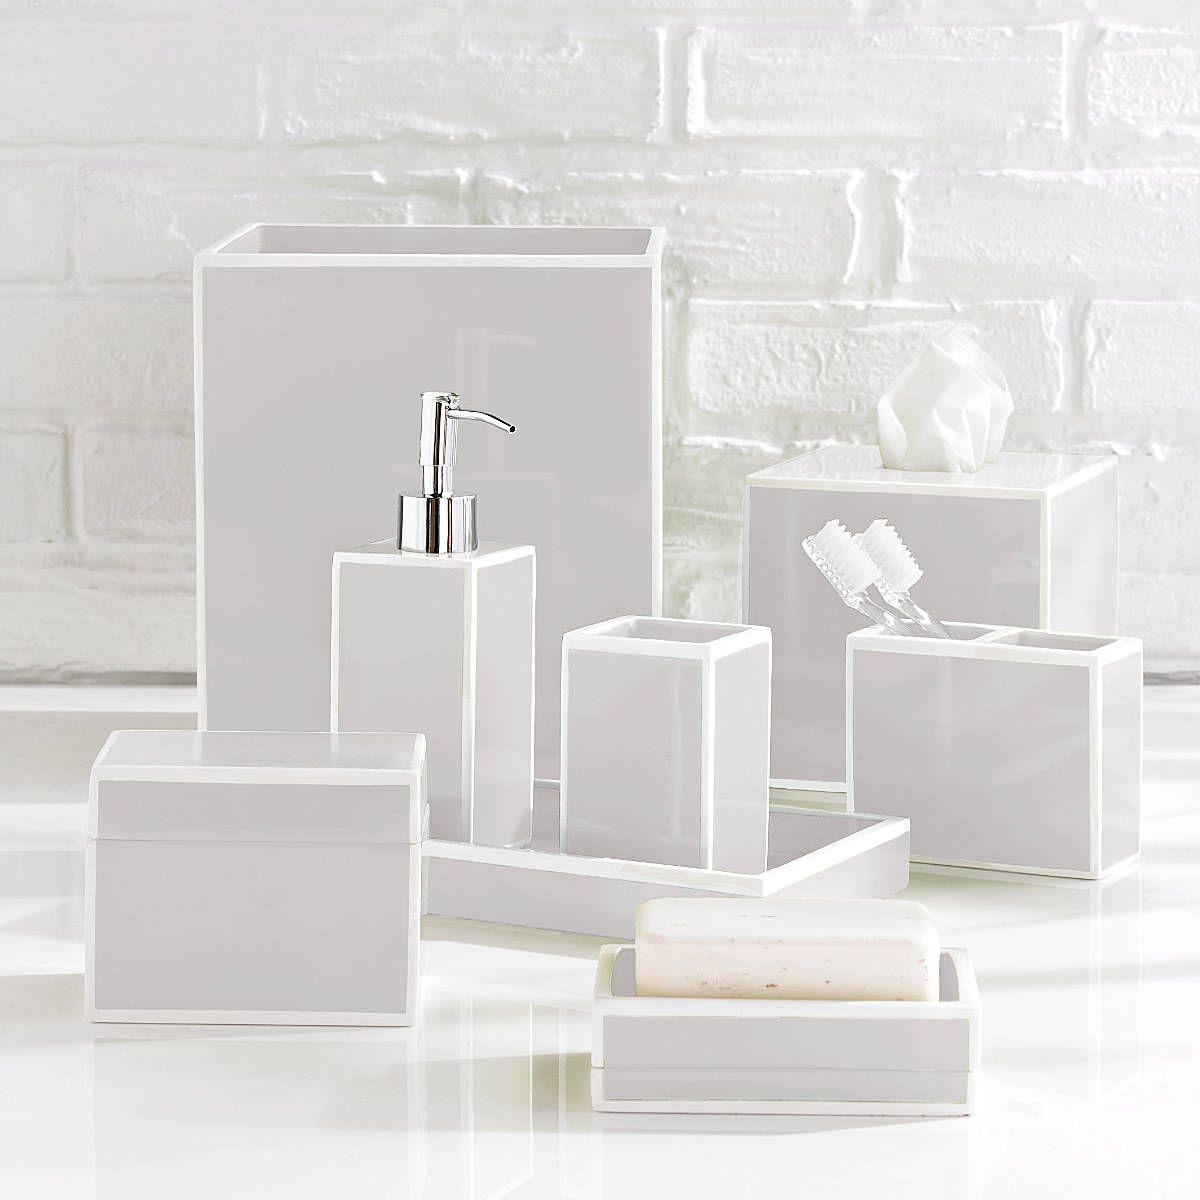 Soho Bathroom Accessories (Kassatex) | bath time | Pinterest ...